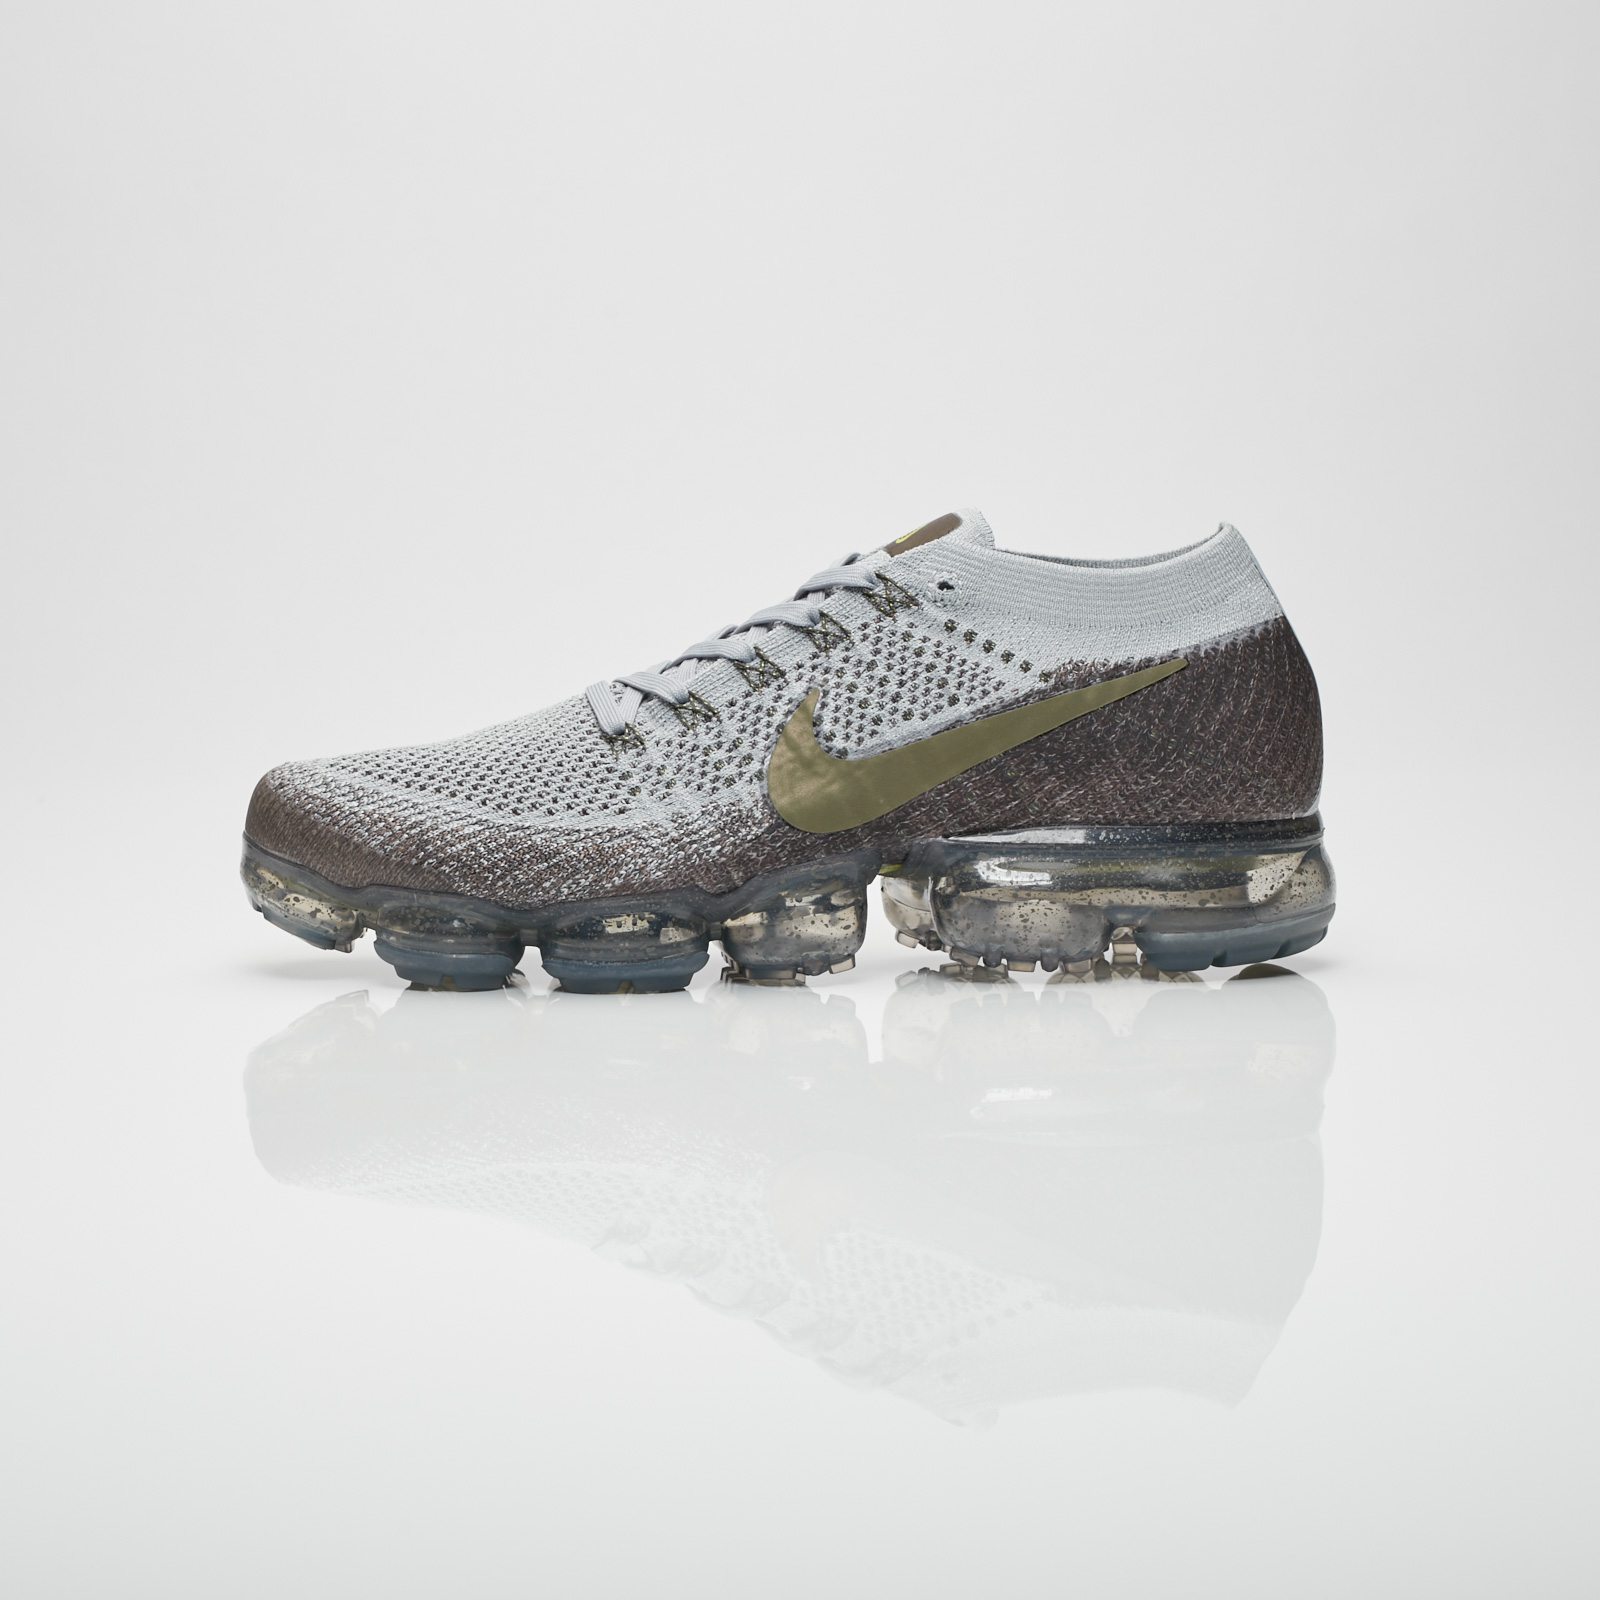 27de7b83cc4 Nike Air Vapormax Flyknit - 899473-009 - Sneakersnstuff